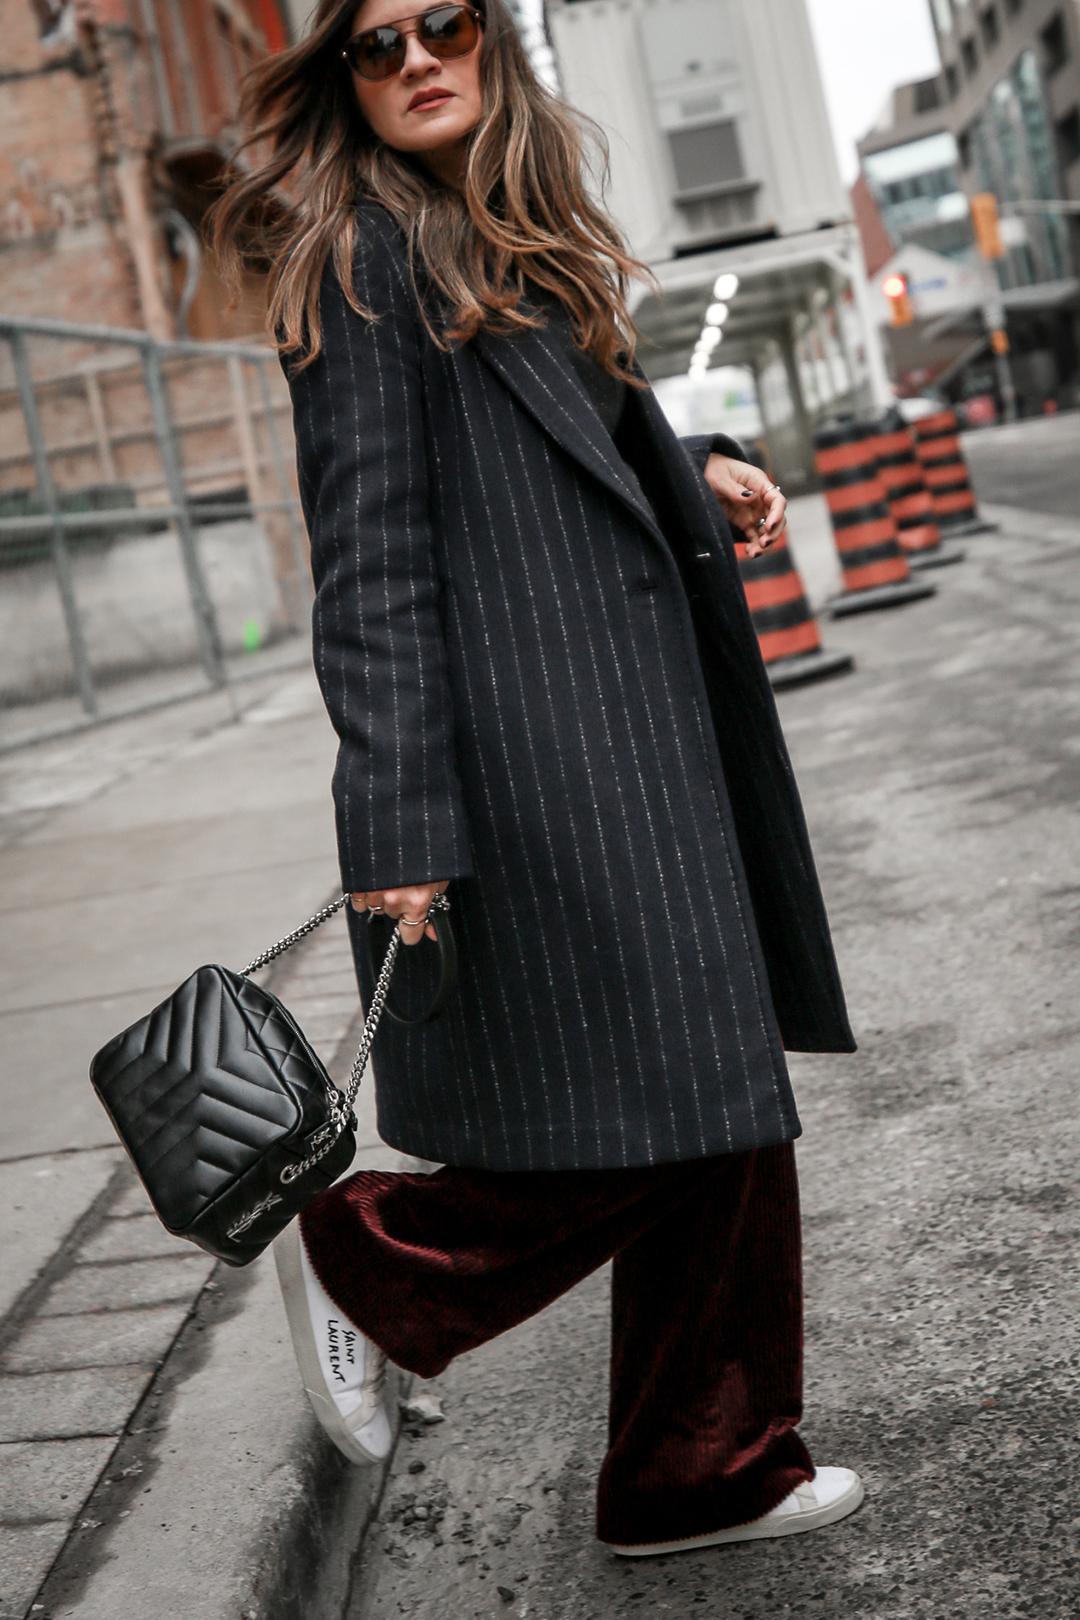 Nathalie Martin Sandro corduroy high waisted pants, Aritzia pinstriped wool Stedman coat, Frank & Oak sweatshirt, Saint Laurent canvas sneakers and small LouLou Bowling Bag, streetstyle, woahstyle.com_4154.jpg